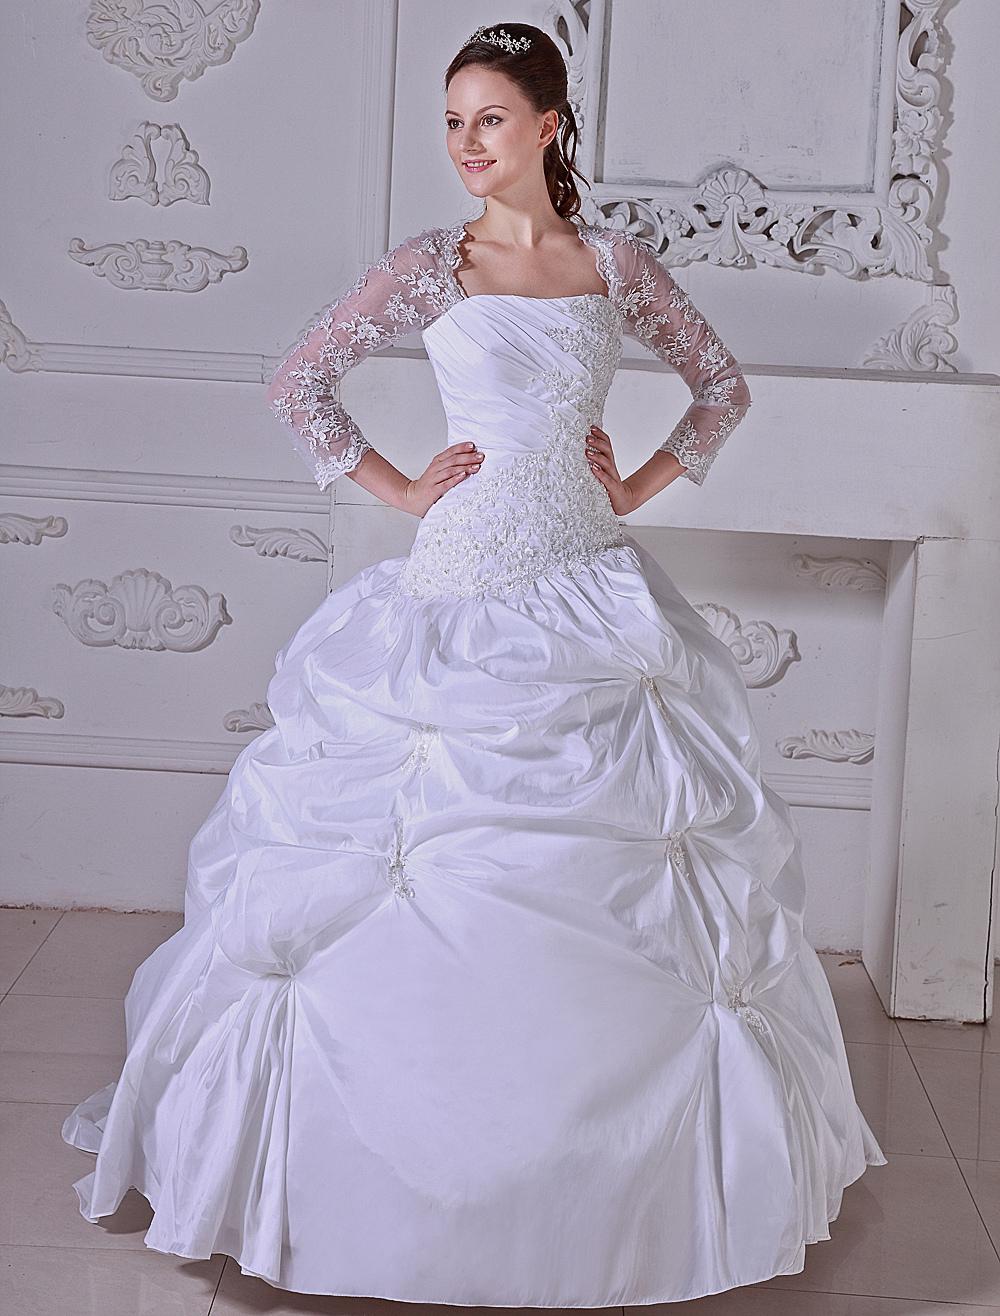 White Ball Gown Pleated Taffeta Wedding Dress photo